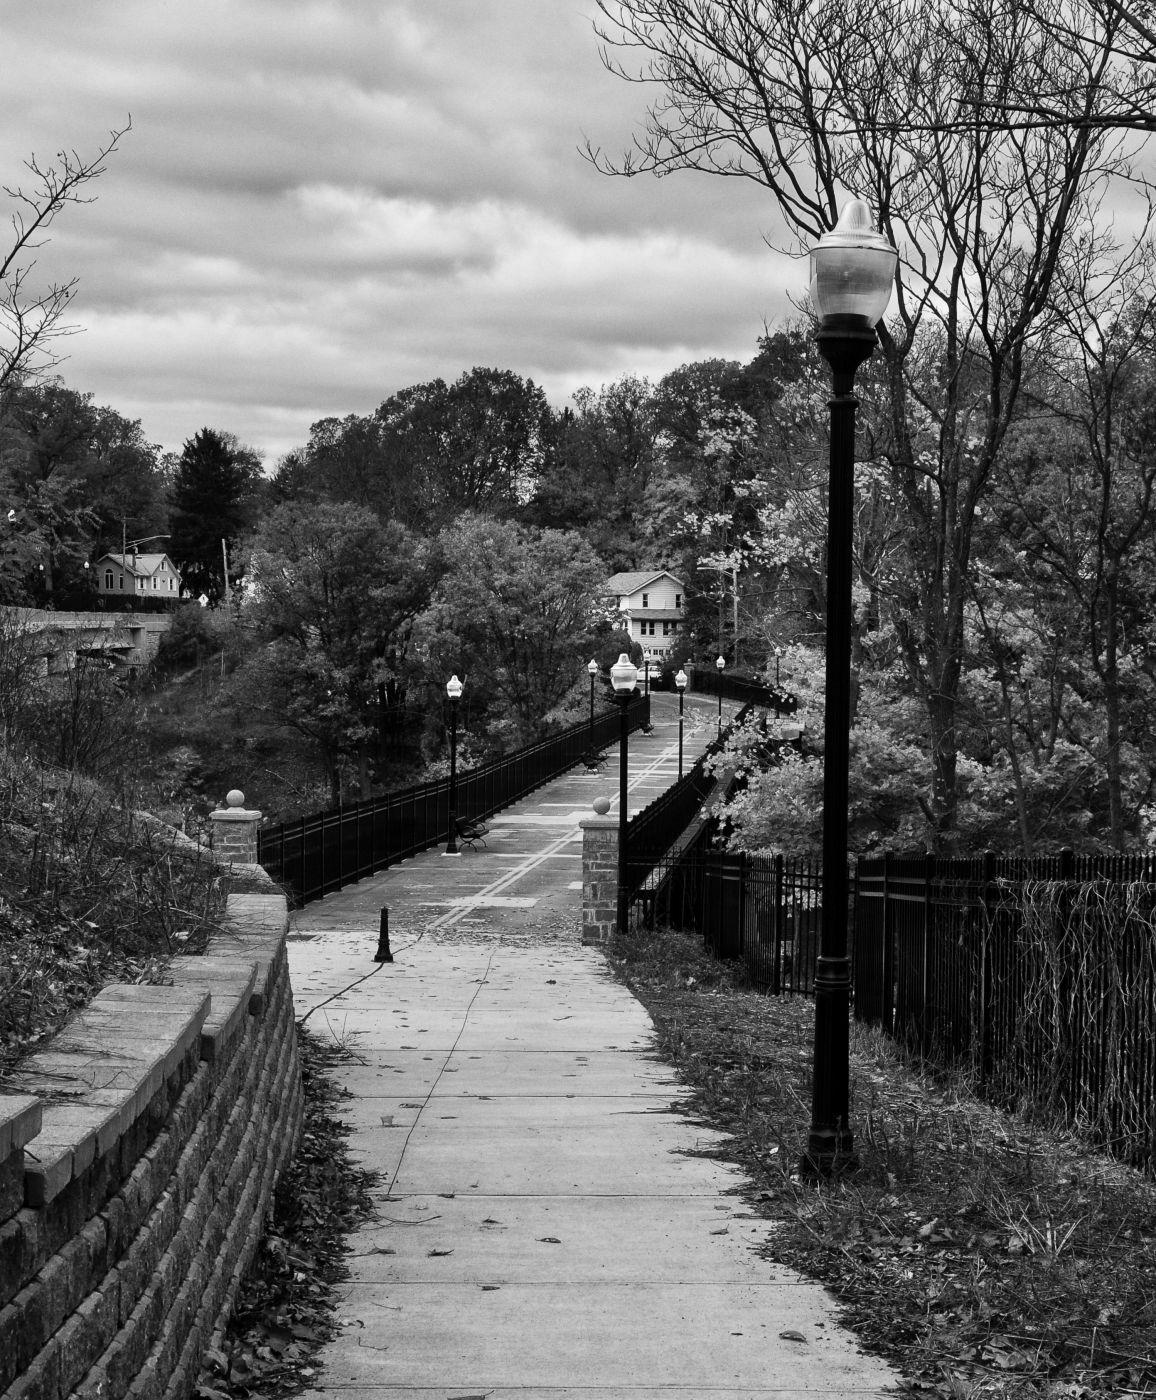 Leafy Bridge, USA